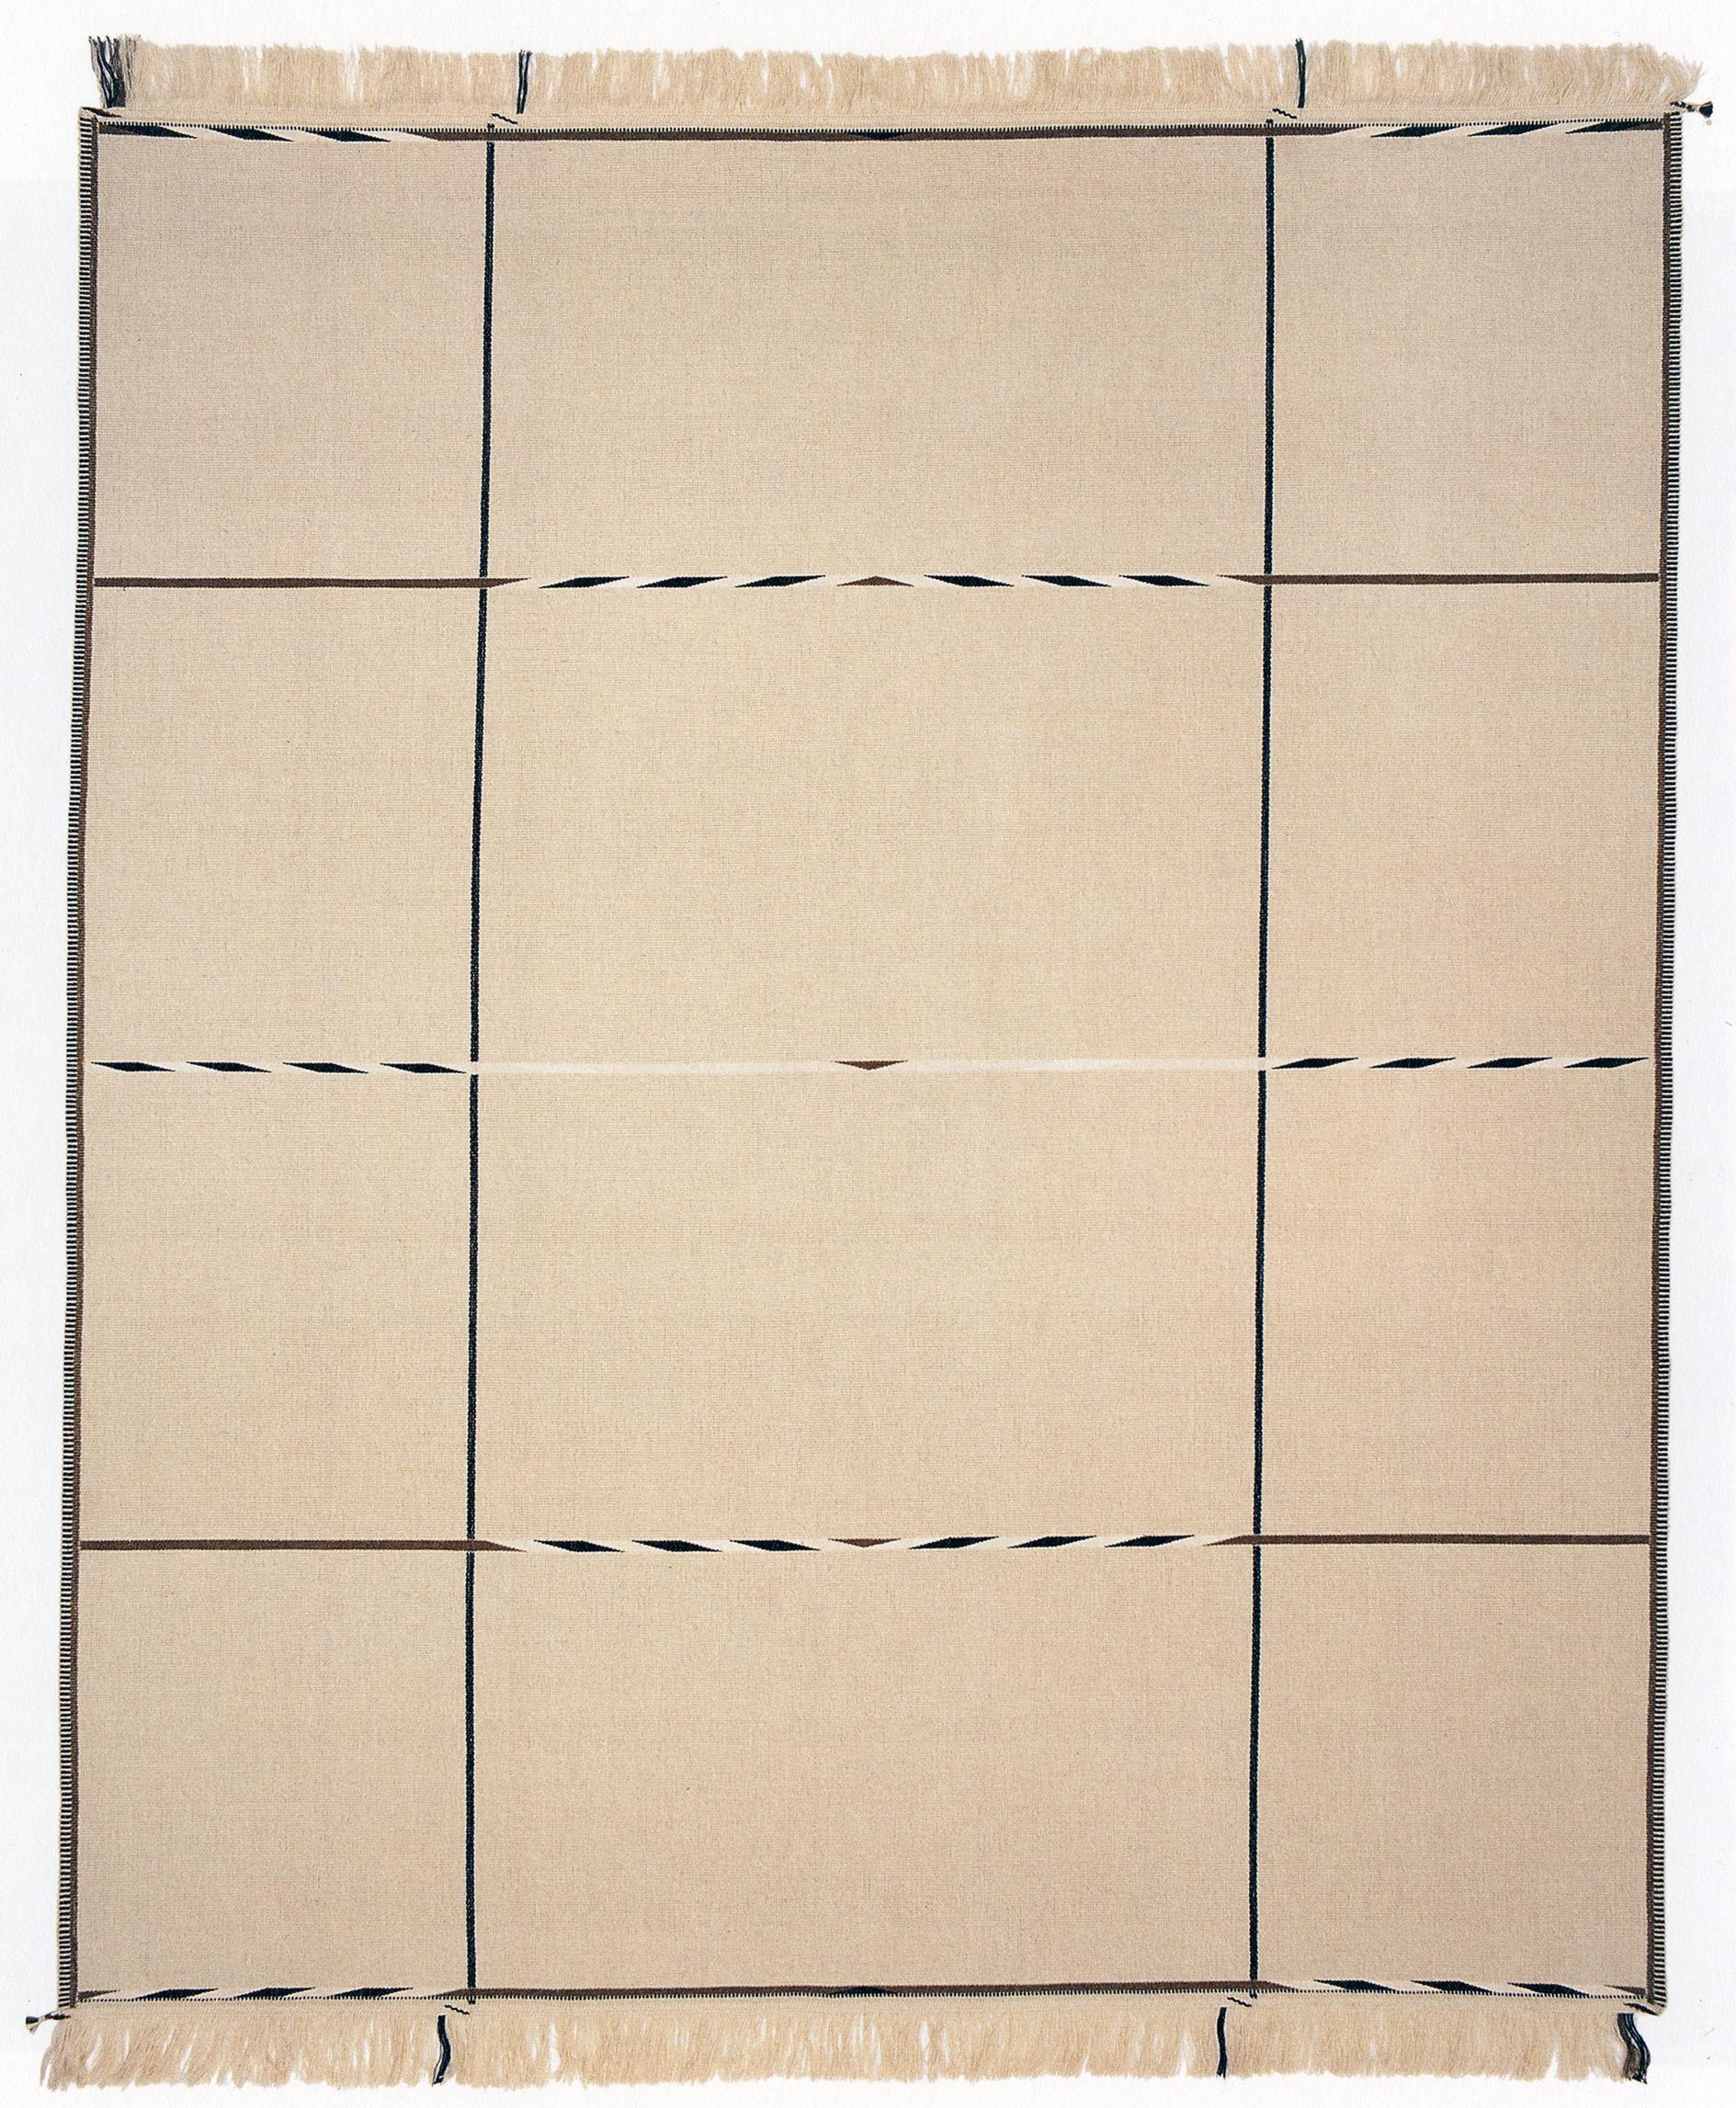 klint-englishwool-horsehair-300x340cm-1996